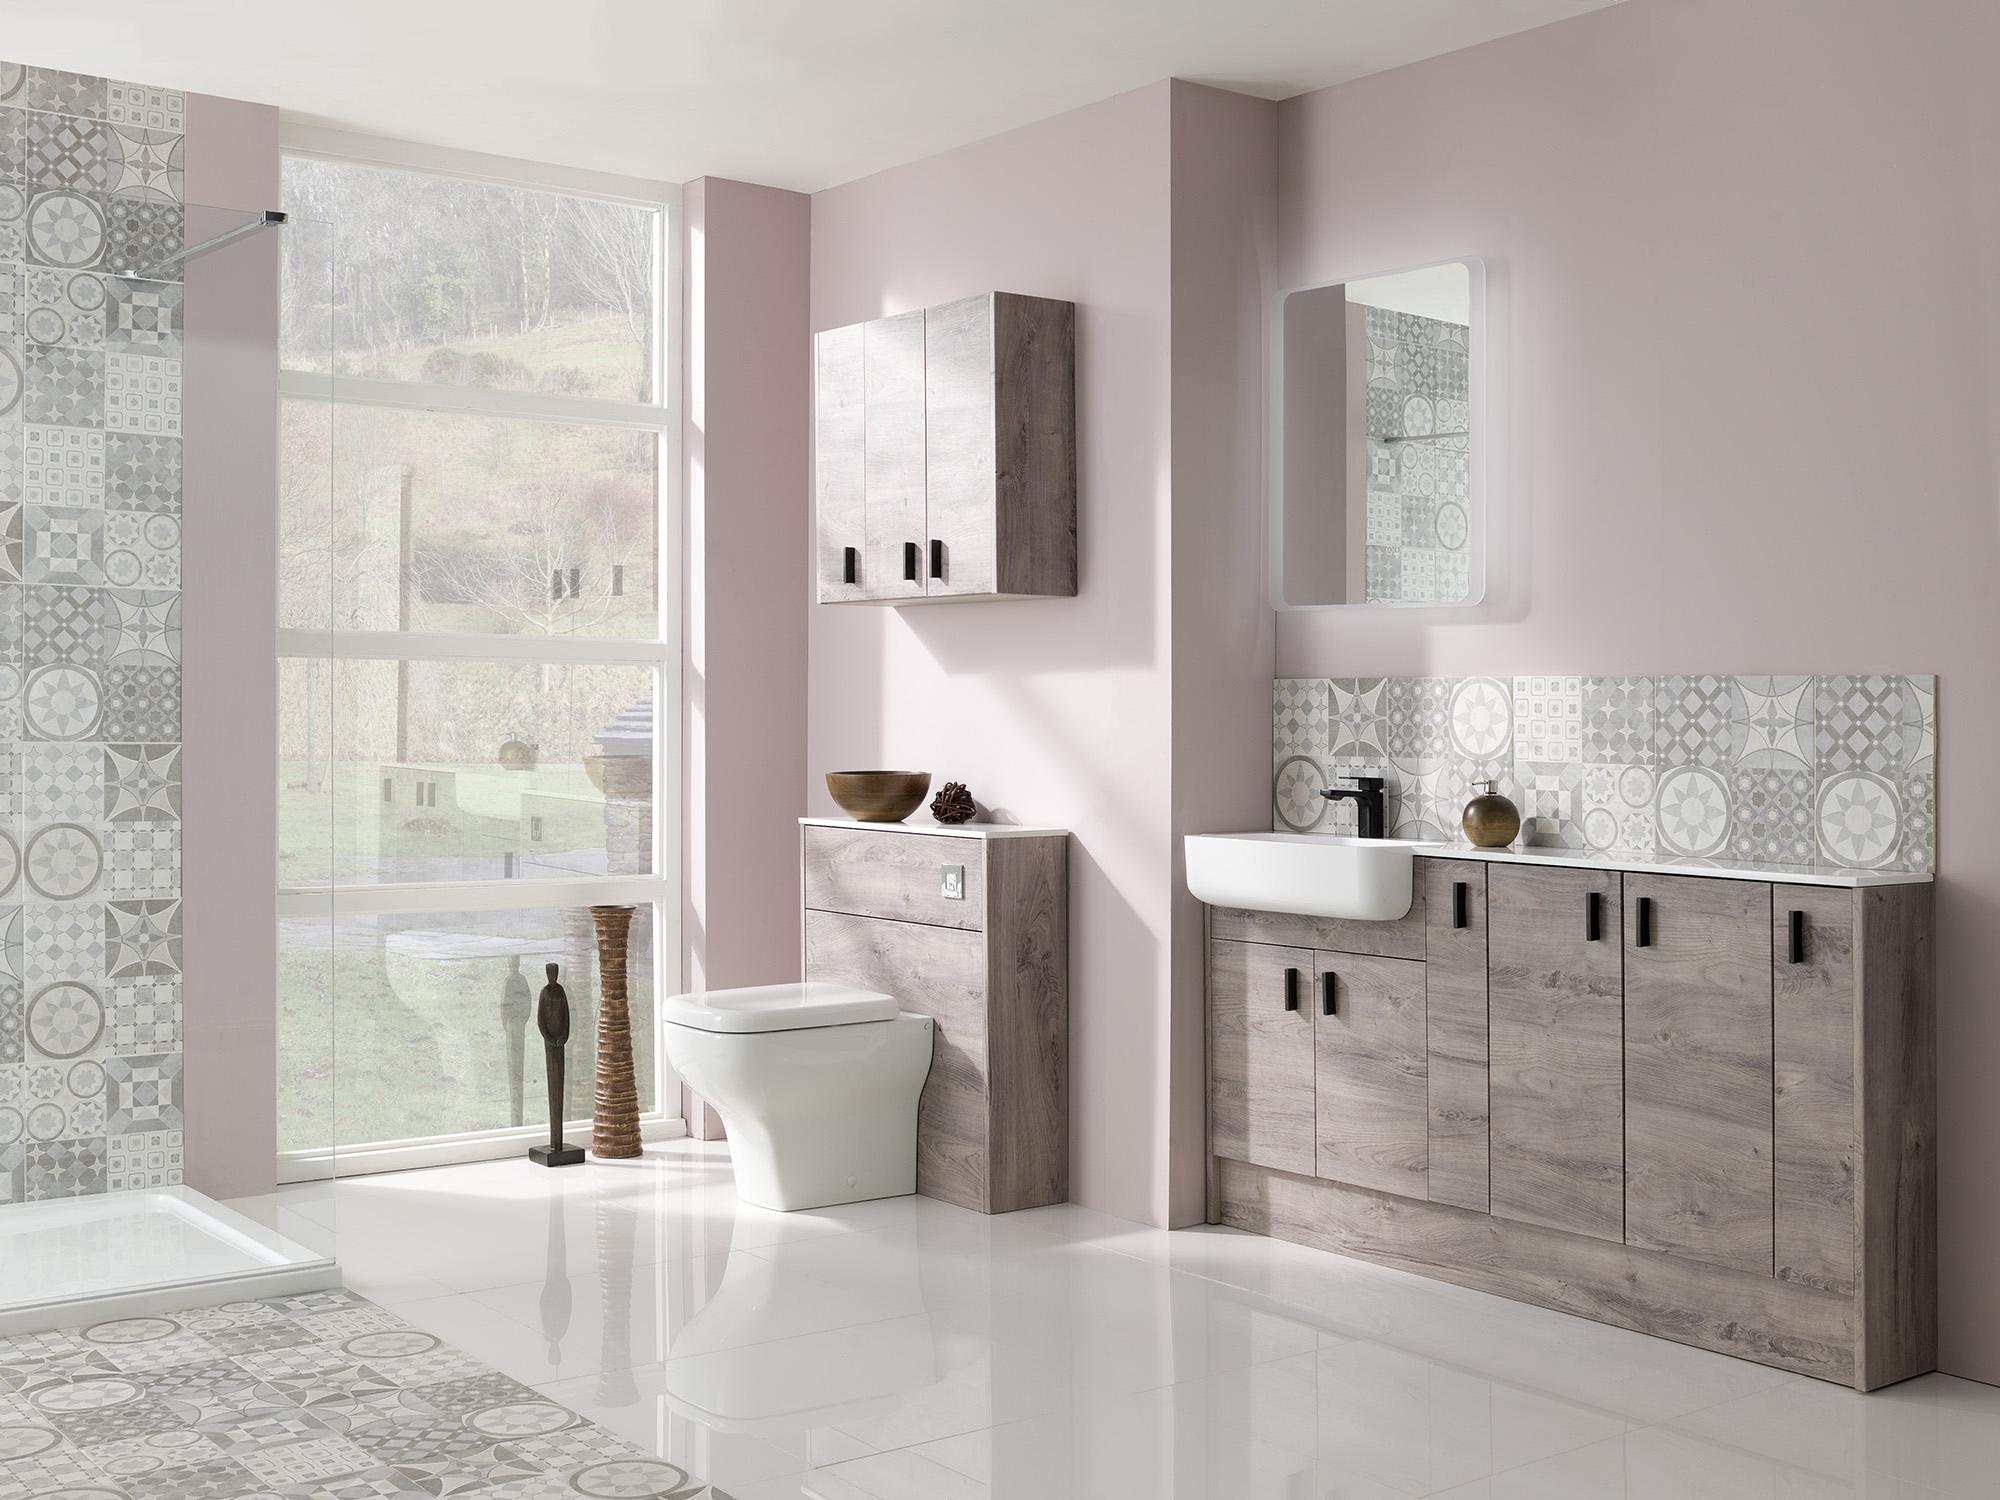 Calypso Bathroom Furniture Faucet Ideas Site